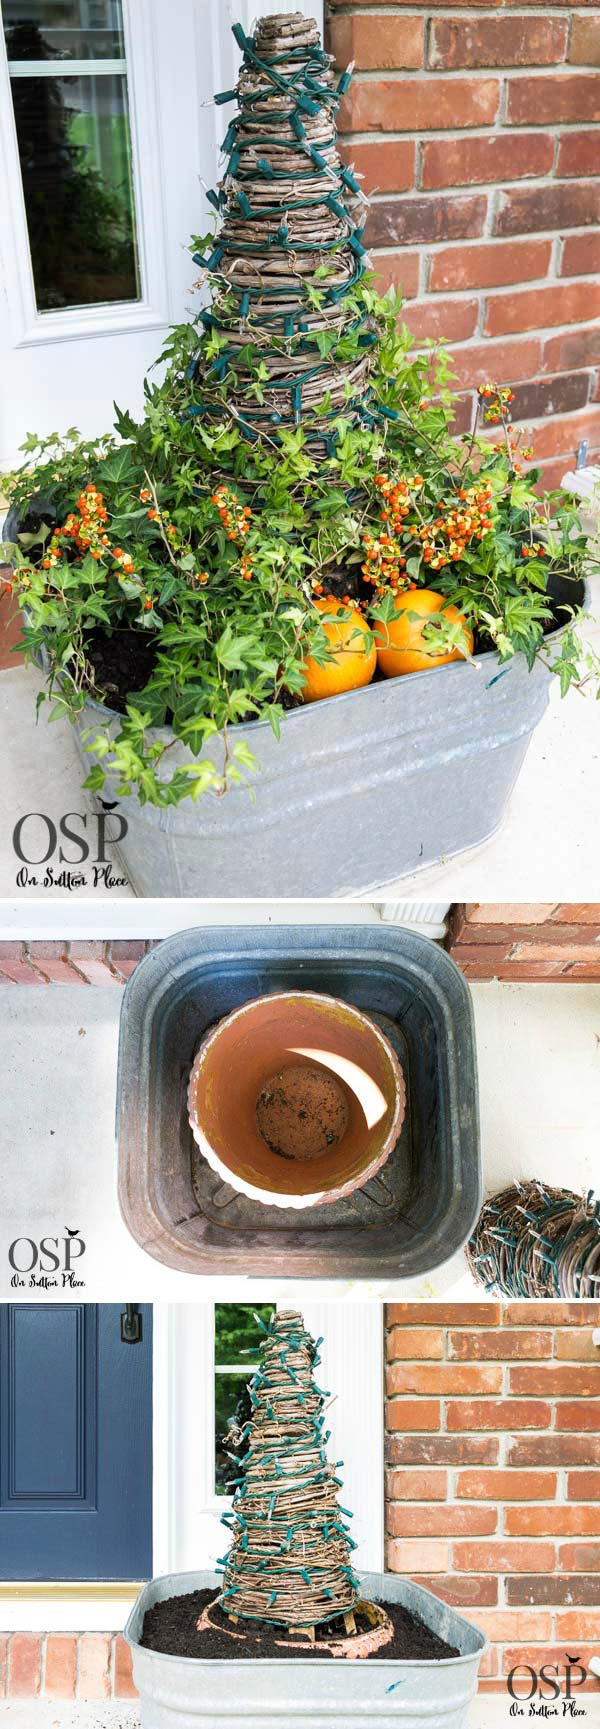 Creative Ideas to Use Galvanized Buckets in Holiday Decor